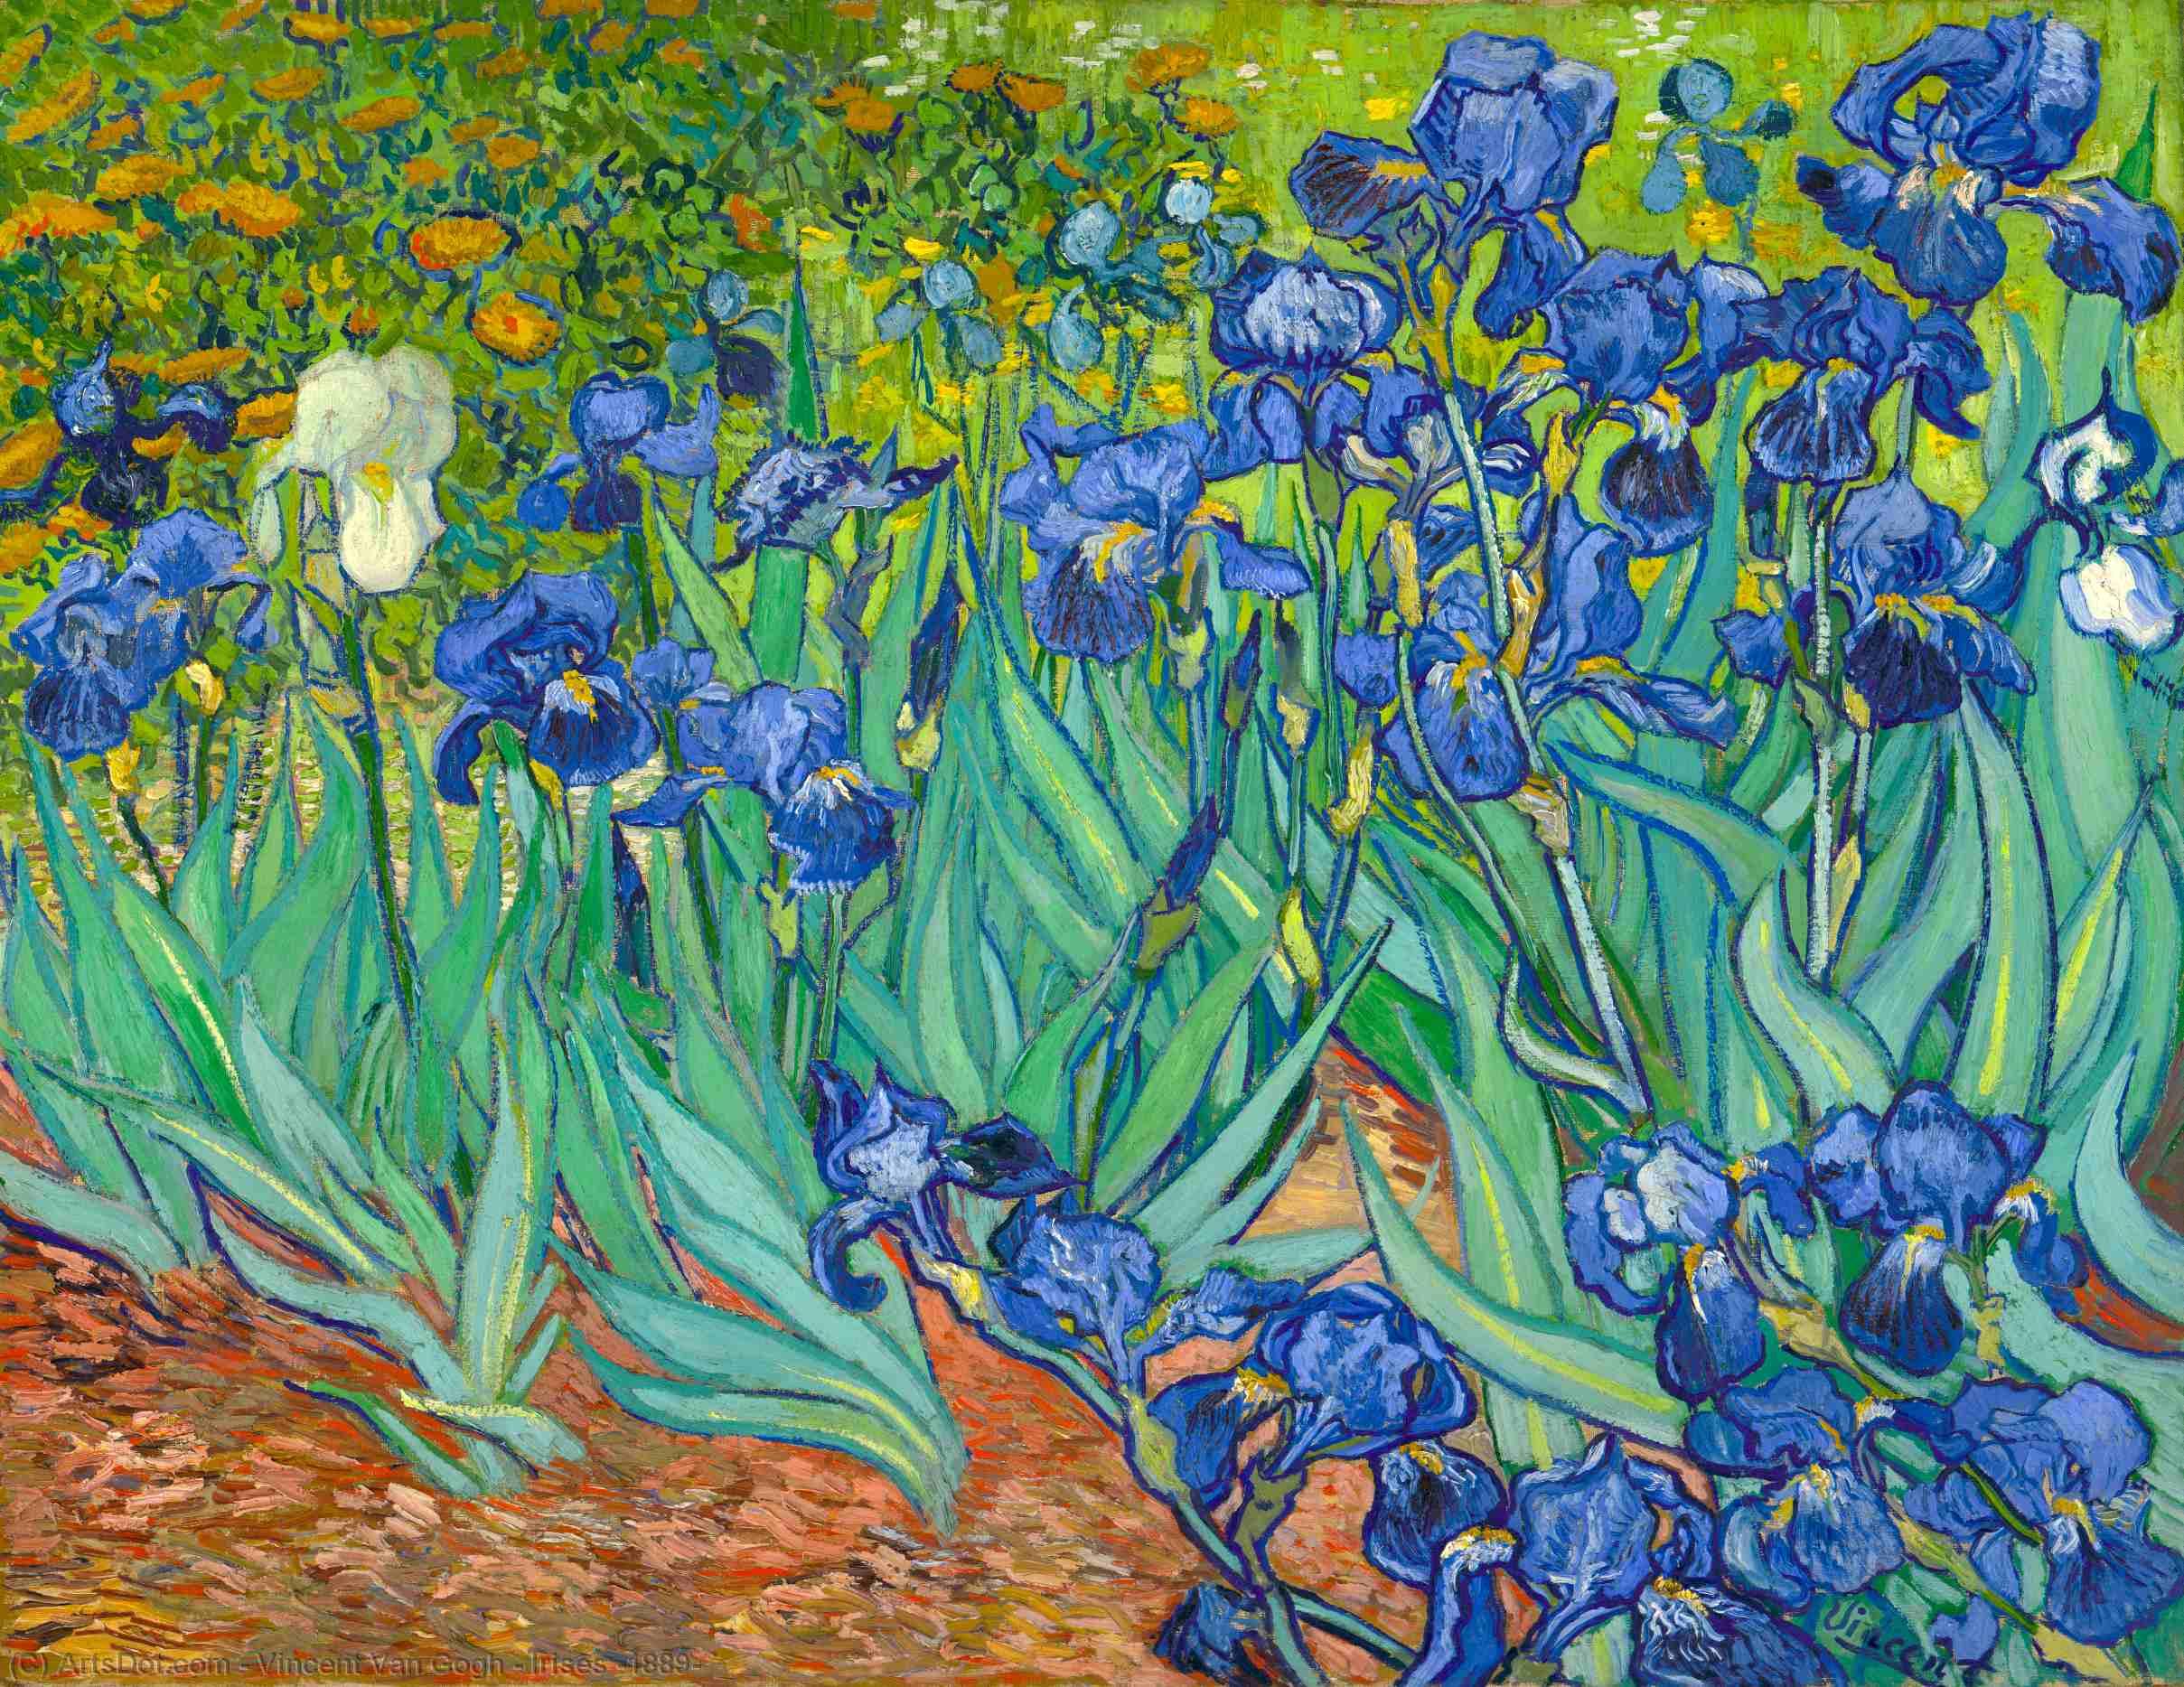 Wikoo.org - موسوعة الفنون الجميلة - اللوحة، العمل الفني Vincent Van Gogh - Irises [1889]